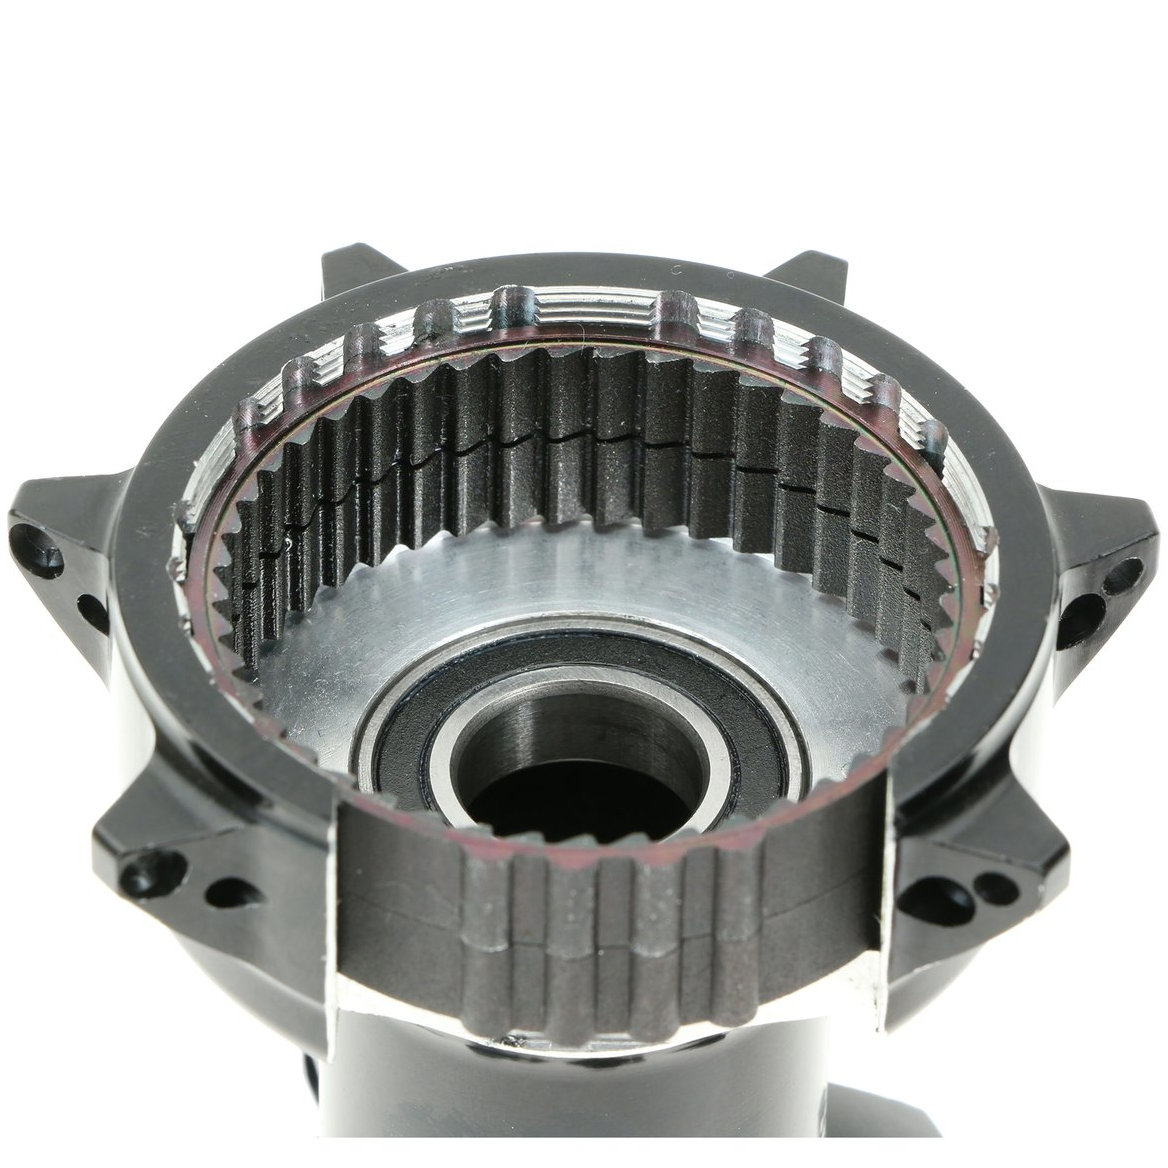 Image of SUNringlé Bubba MTB Rear Hub - Disc - 12x157mm SuperBoost - 28 Hole